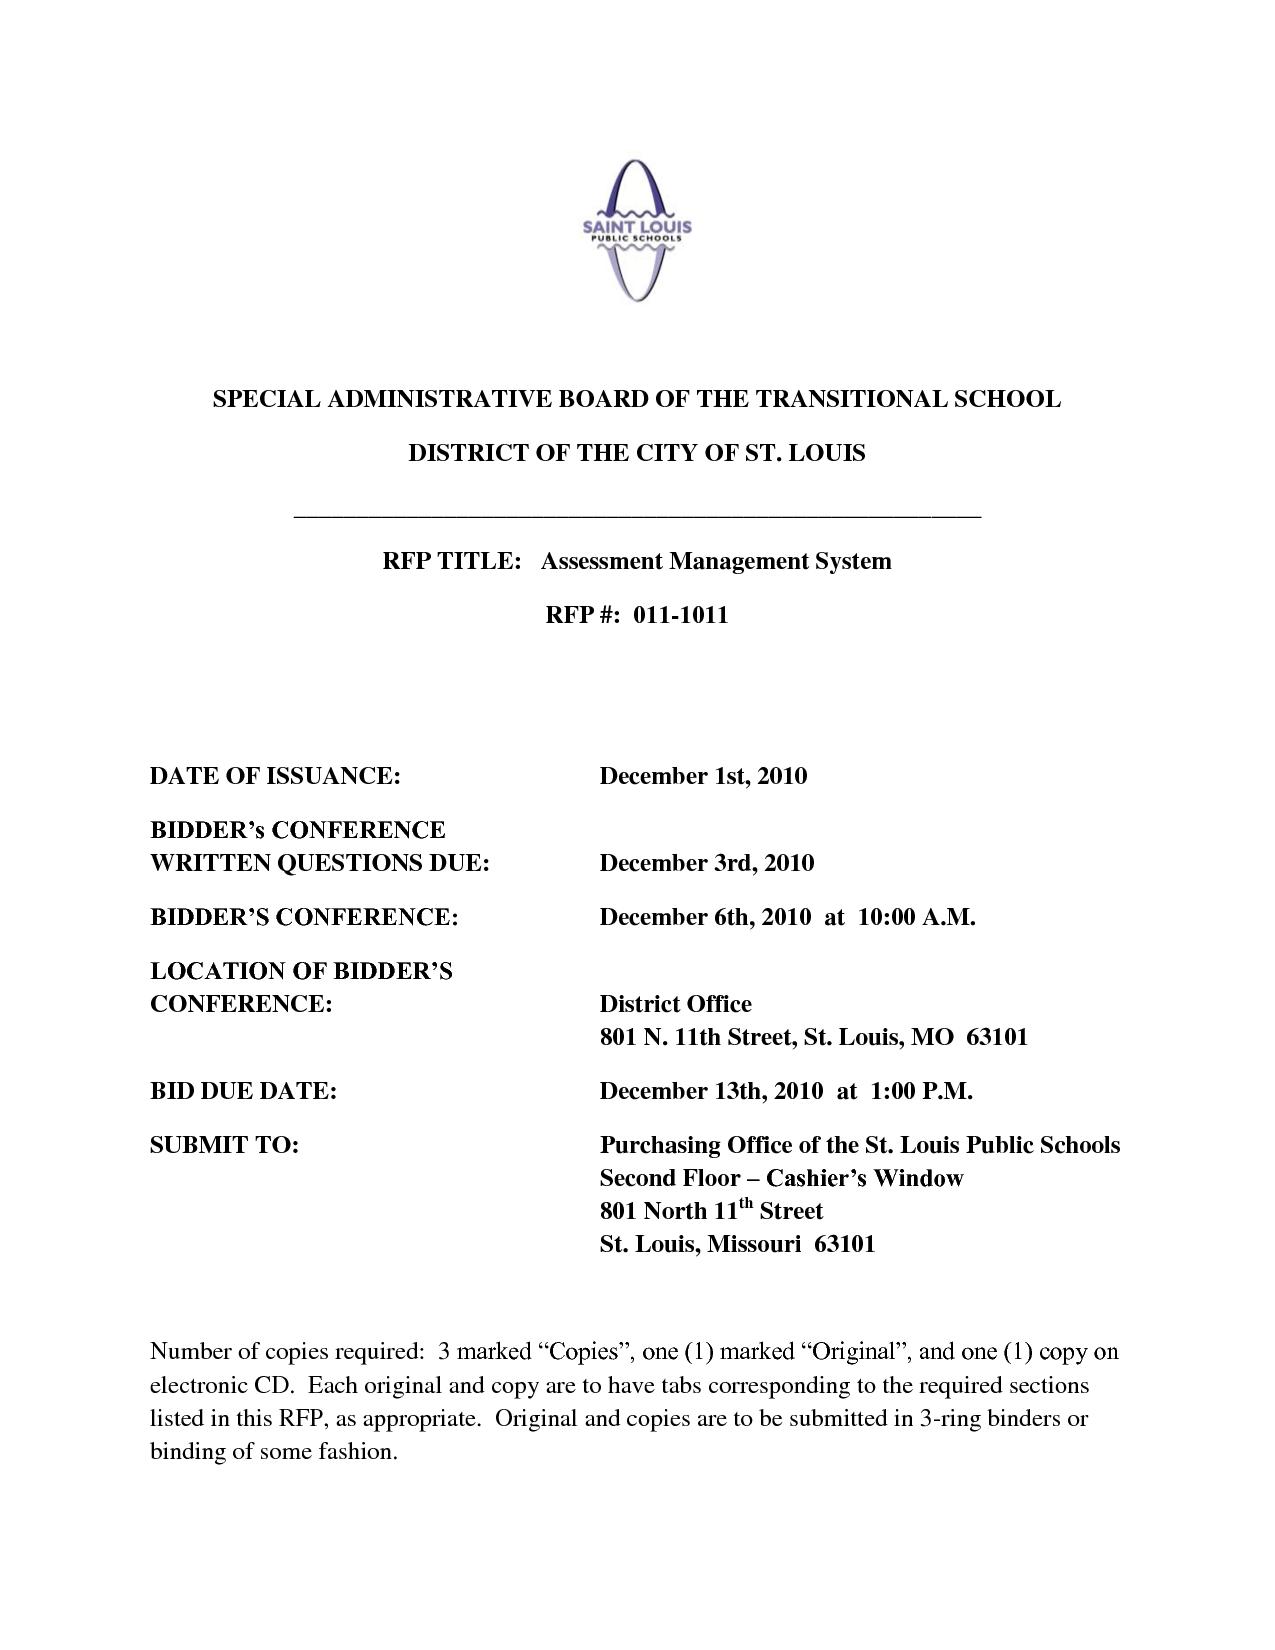 Free Printable Resume Template Http Www Resumecareer Info Free